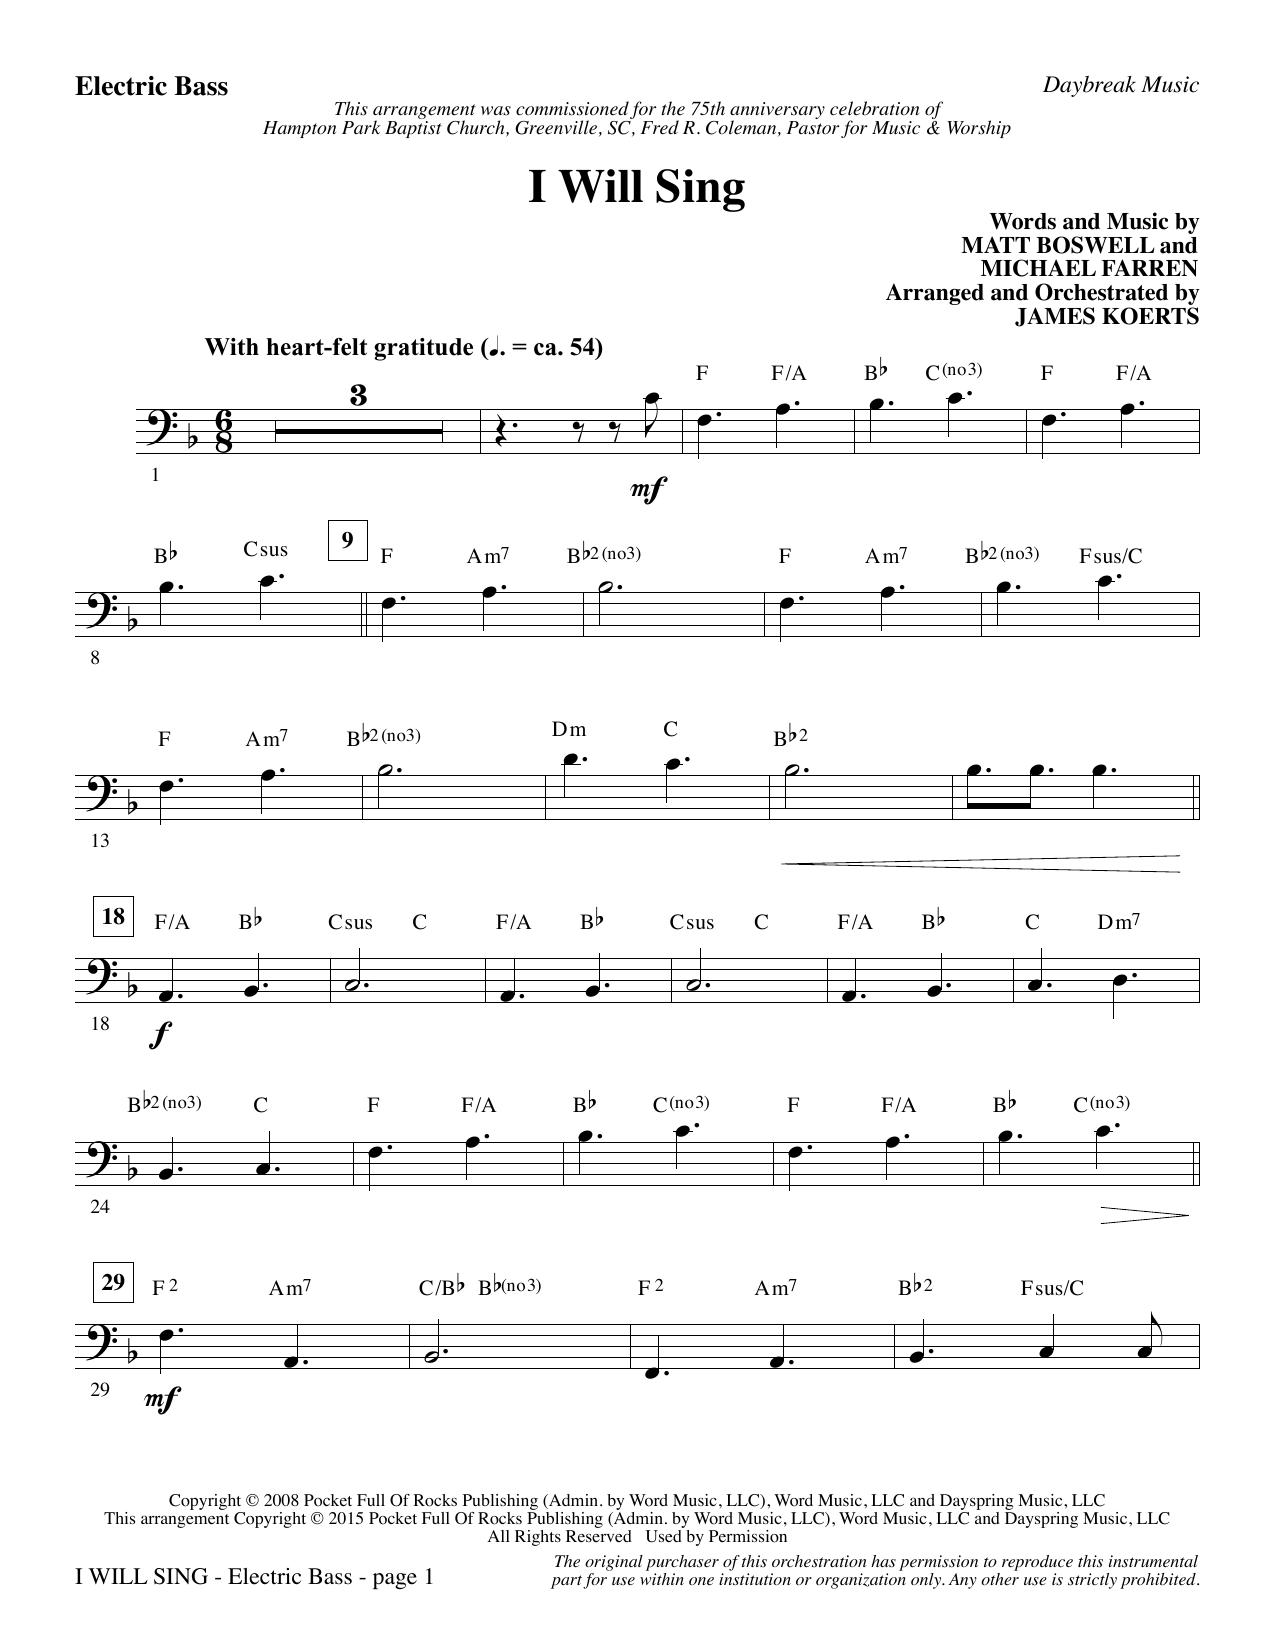 I Will Sing - Electric Bass sheet music